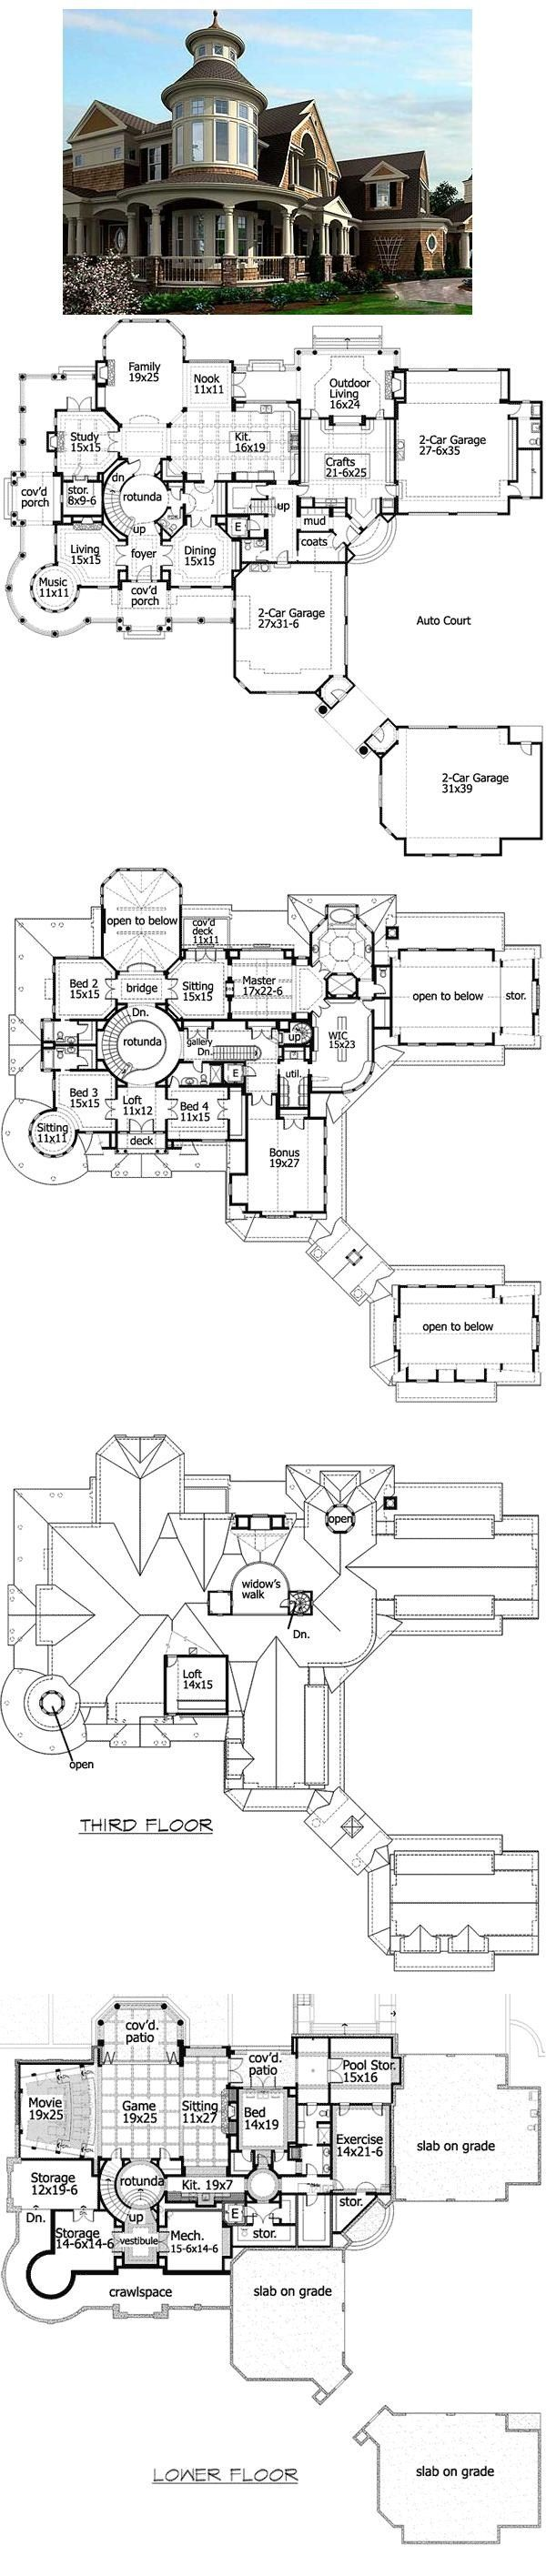 luxury House Plans With Elevators 100 Images Luxury